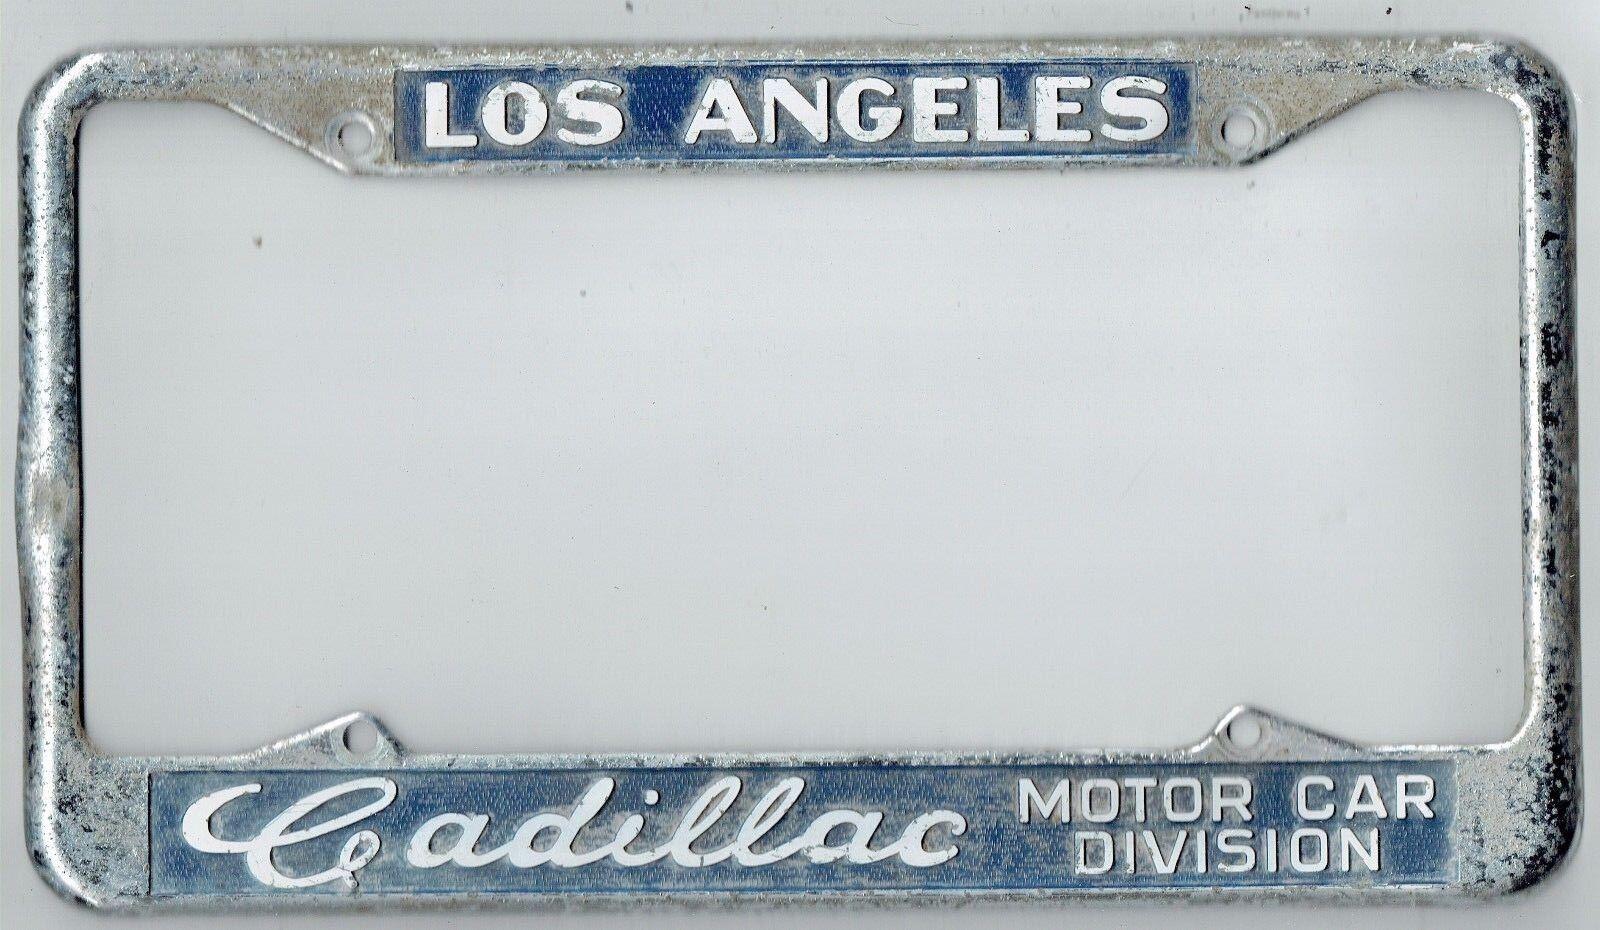 Glendale California Allen Gwynn Chevrolet Vintage Dealer License ...